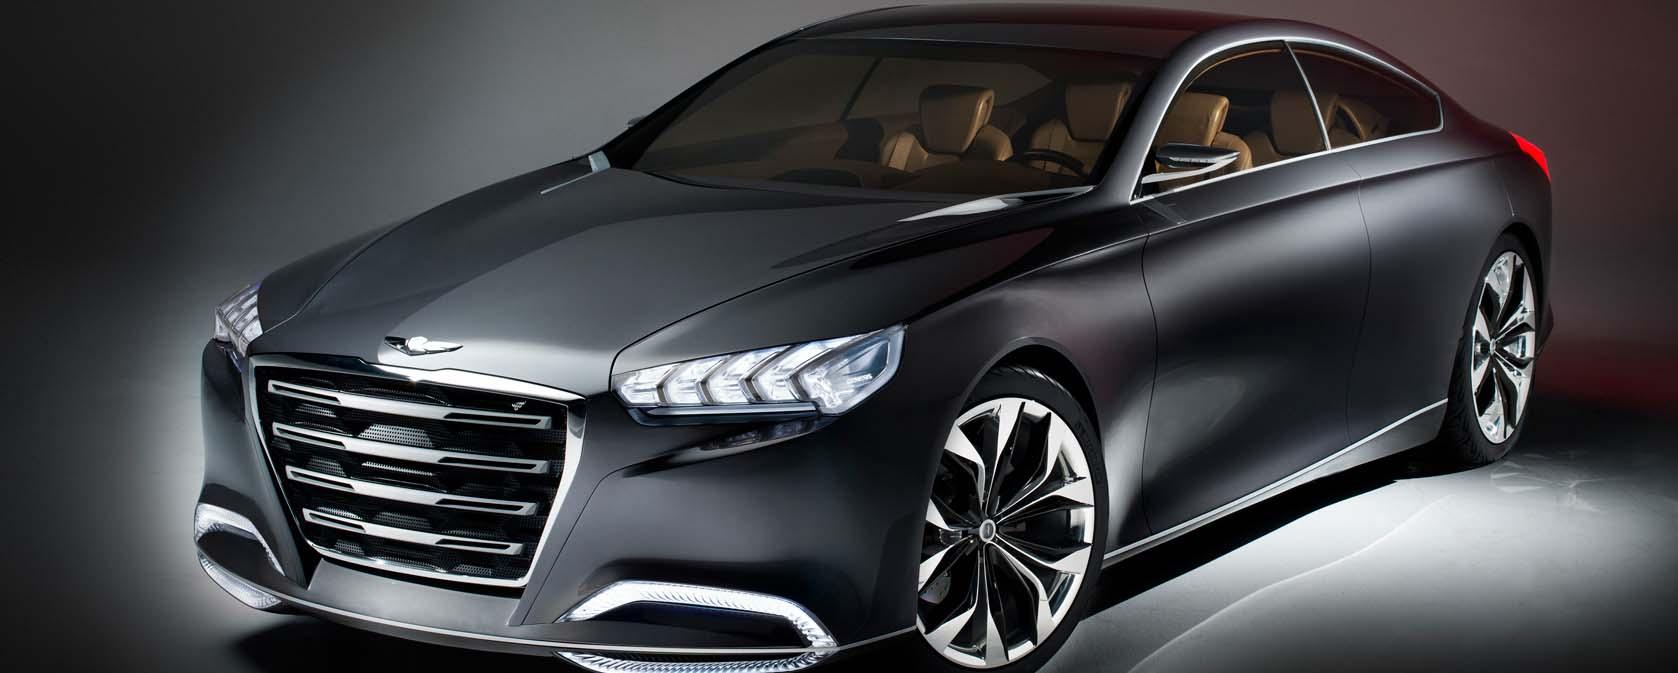 Hyundai planira ući u premium segment